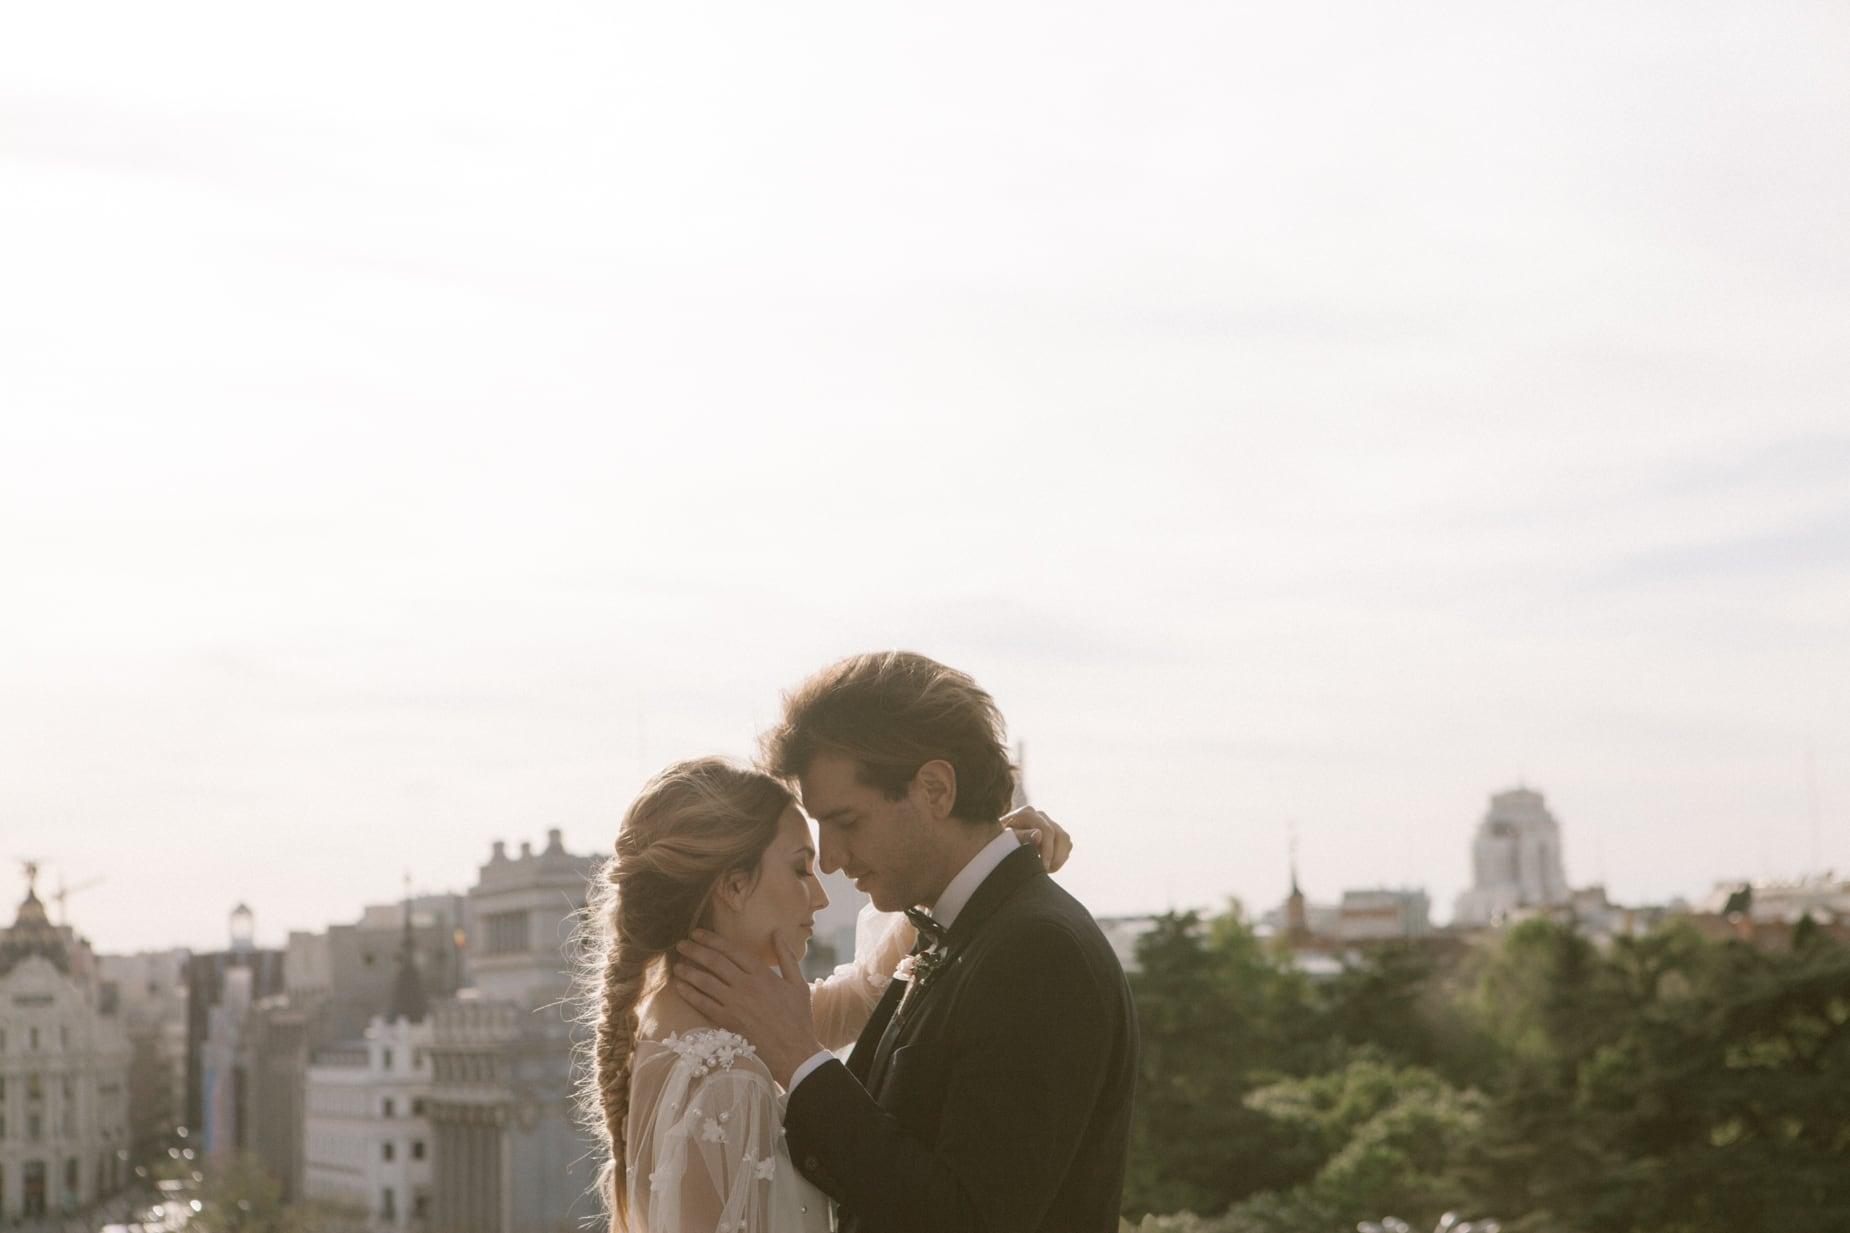 fotografo-de-boda-elegante-teraza-de-cibeles-en-madrid-kaleidoswedding